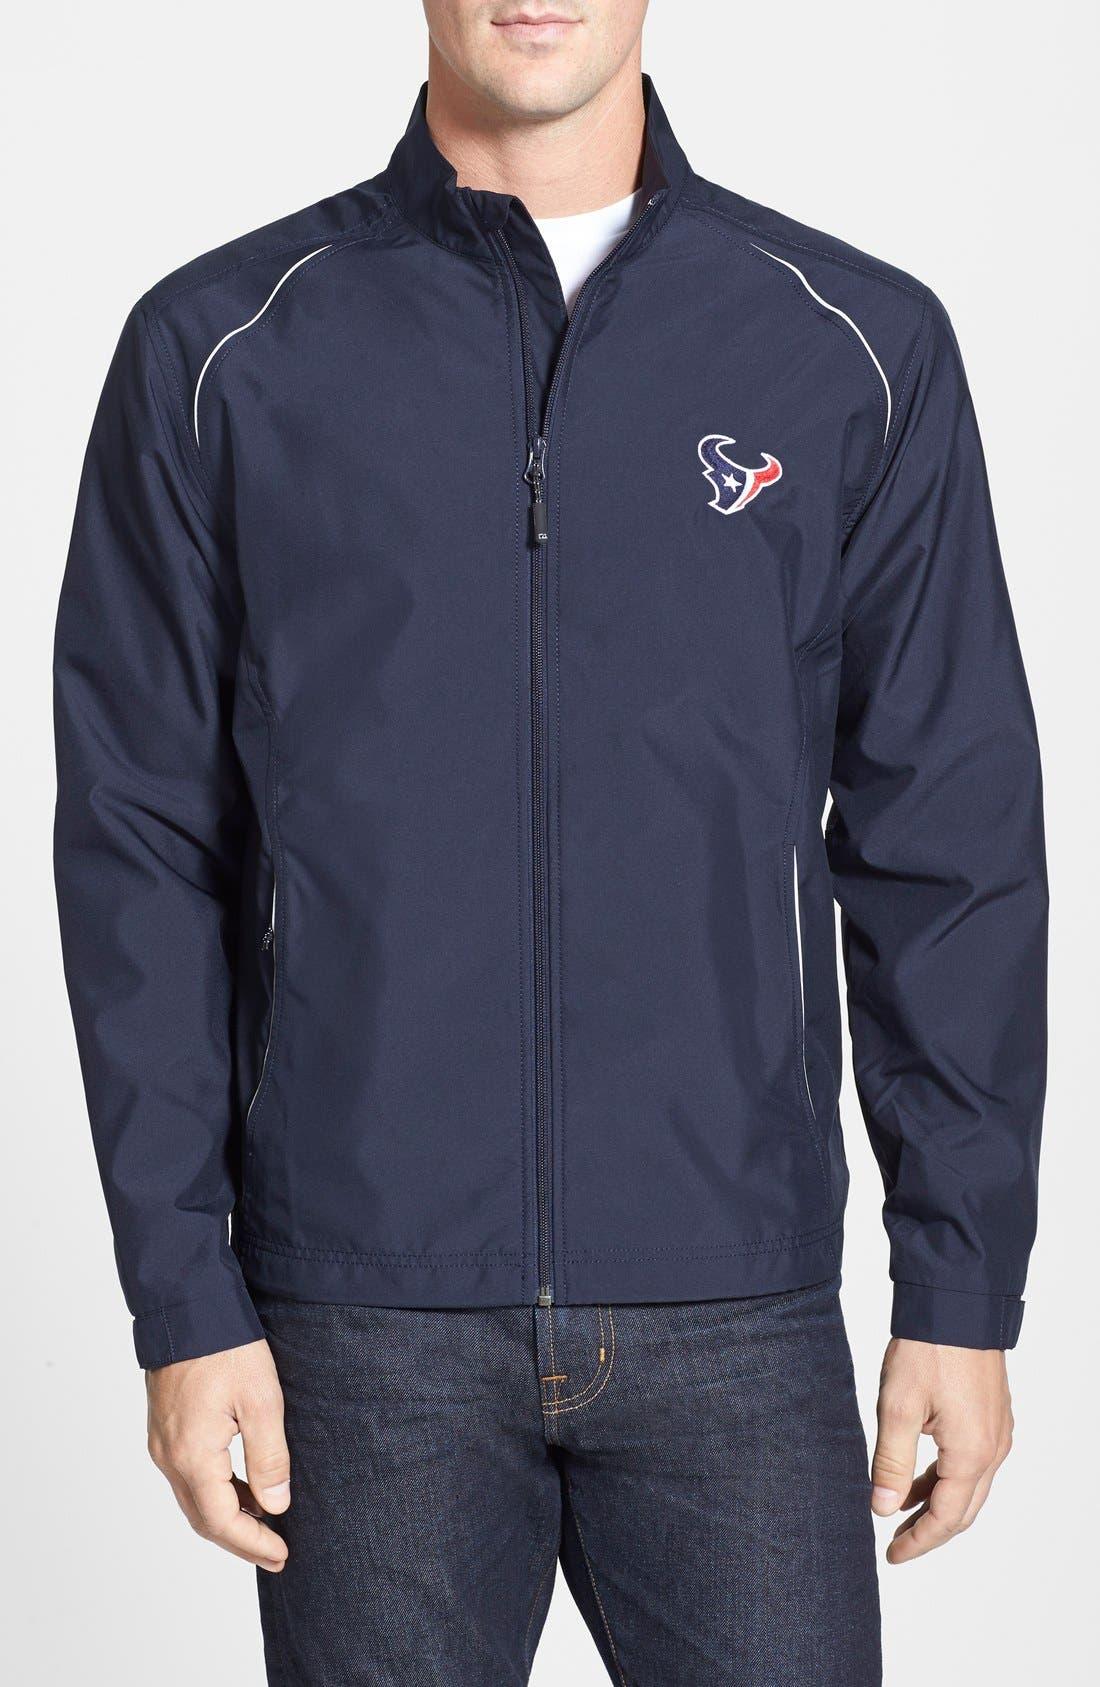 Houston Texans - Beacon WeatherTec Wind & Water Resistant Jacket,                             Main thumbnail 1, color,                             420